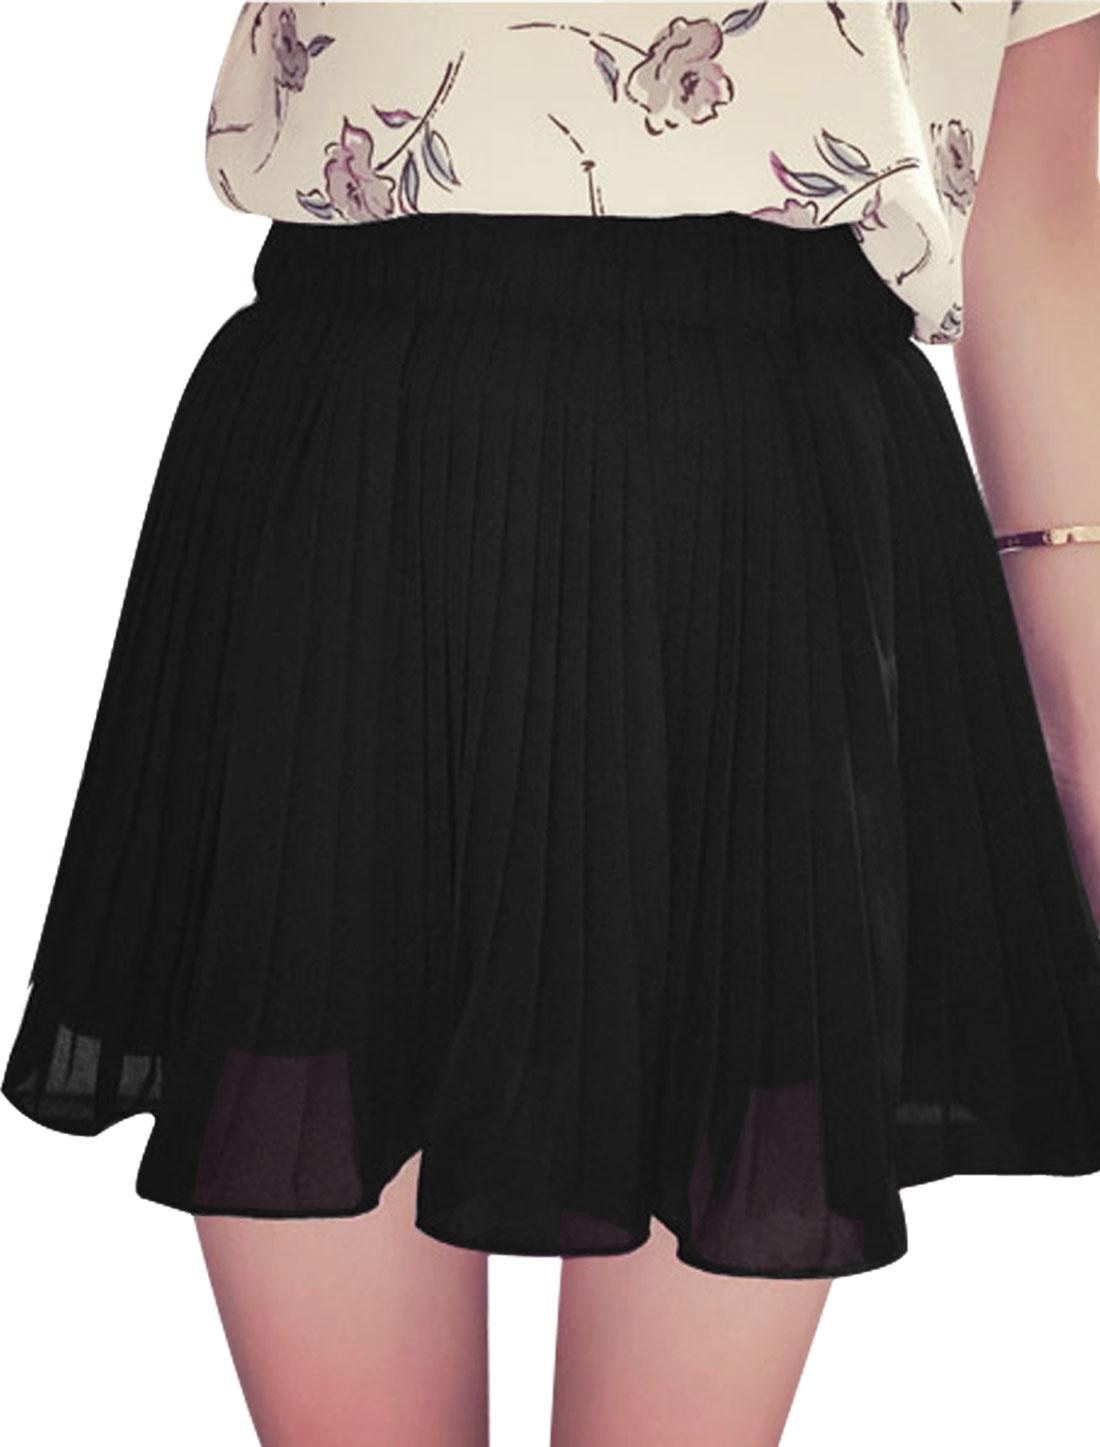 Women Elastic Waist Mid Rise Pleated Casual Chiffon Skorts Black XS